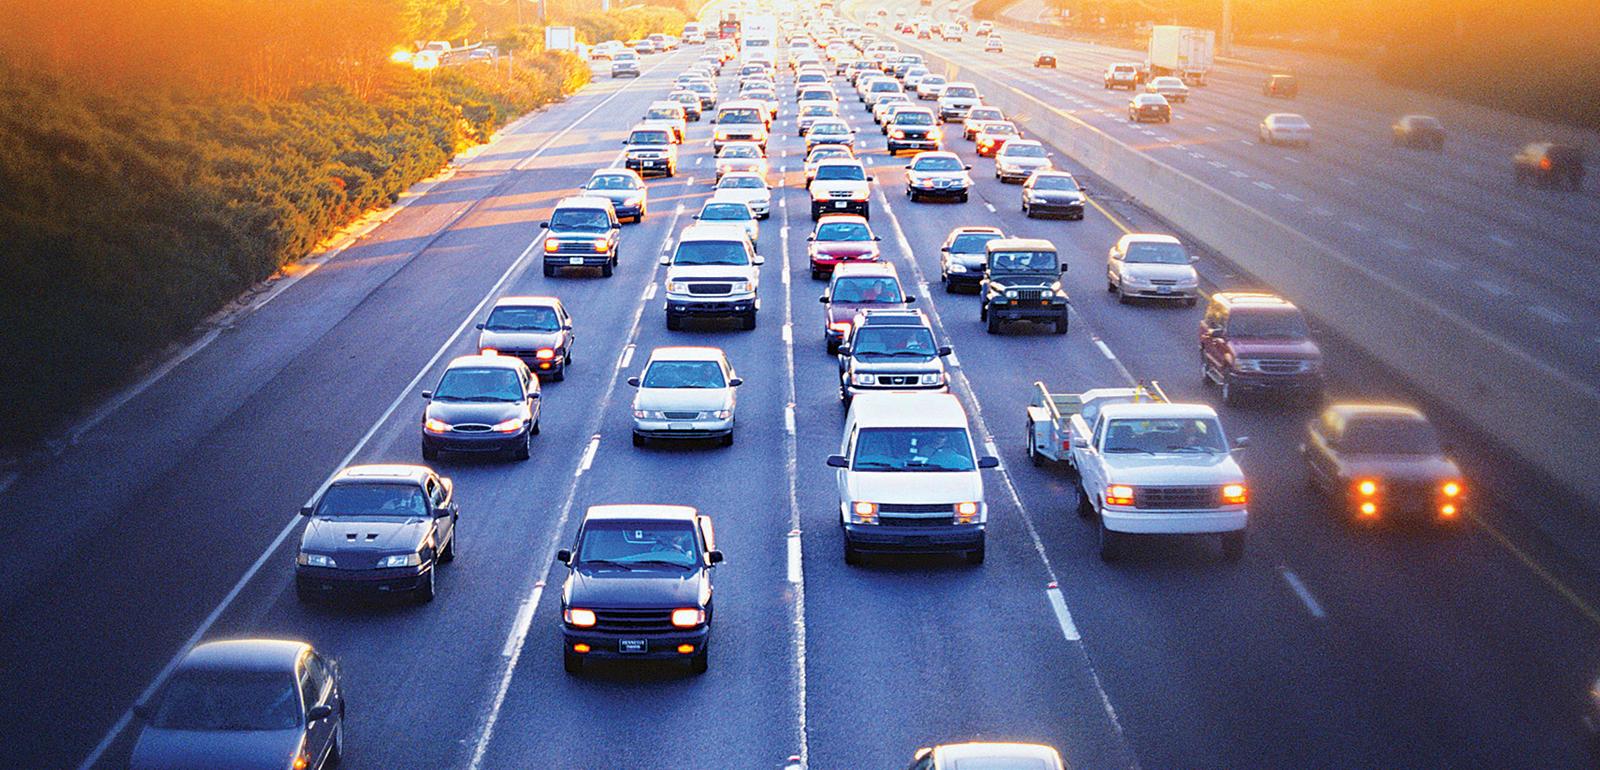 Consumer_Reports_Car_Insurance_Donation_Box_3.png (1600×770)